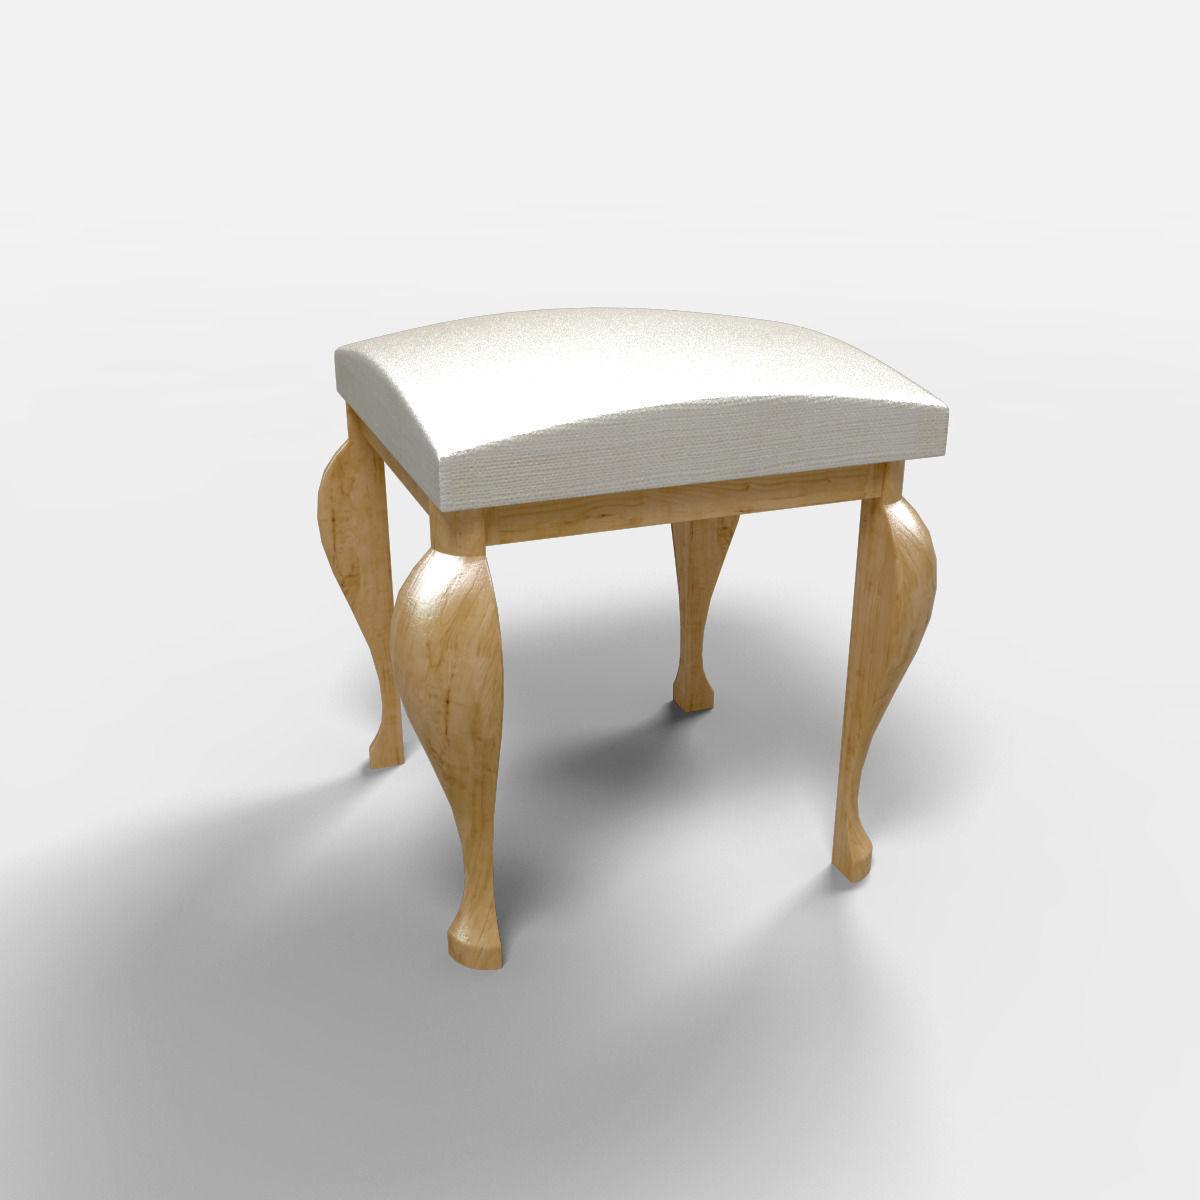 Rustic Furniture Banqueta Santana